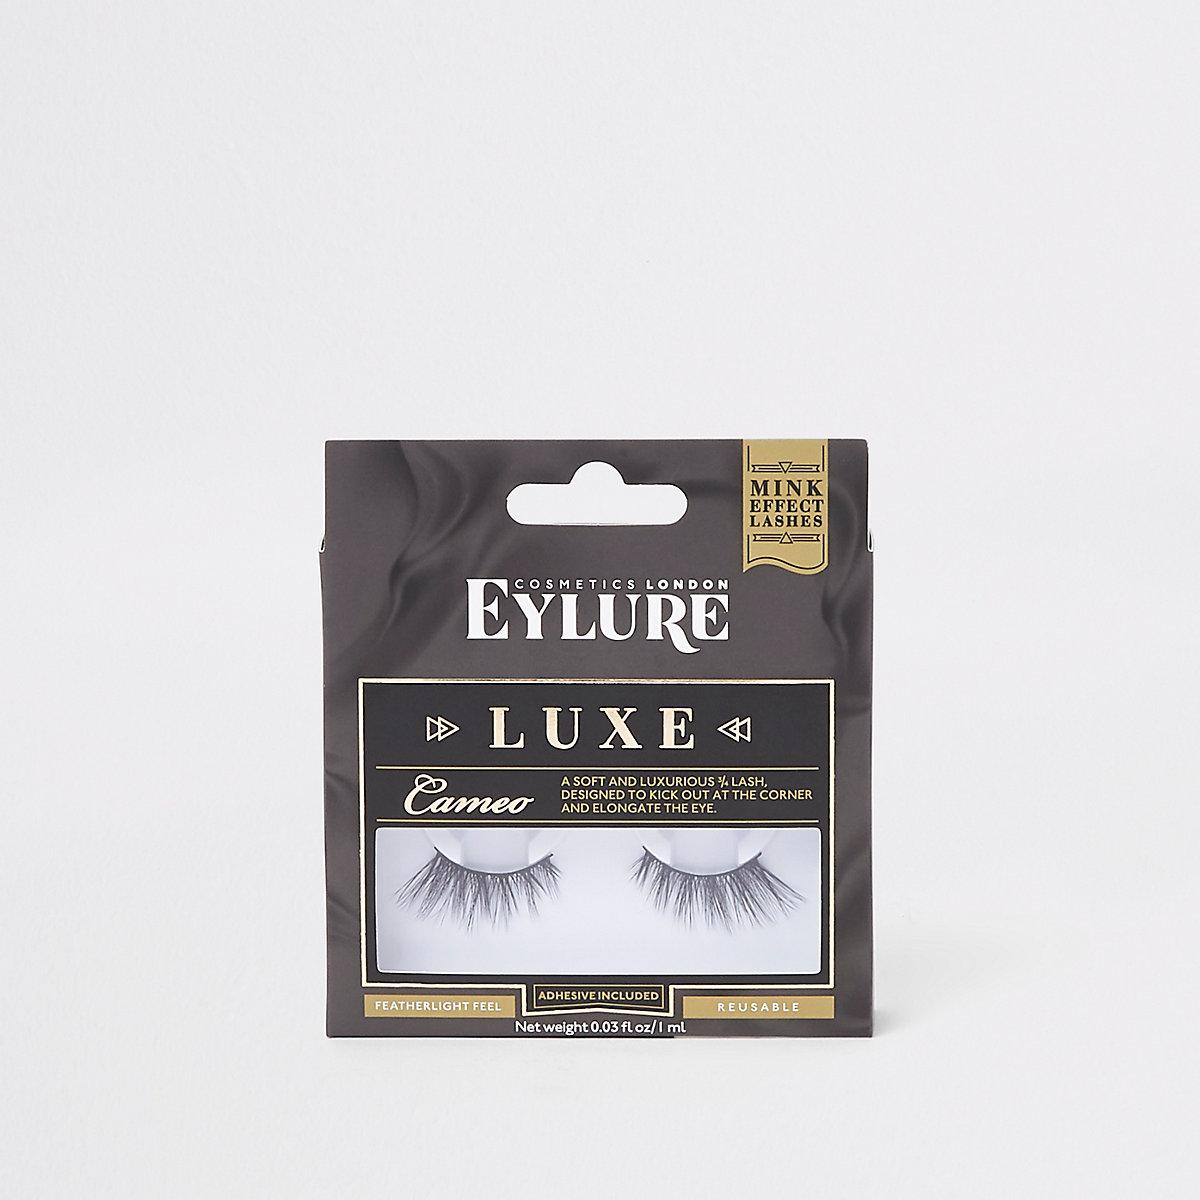 Eylure Luxe Collection Cameo false eyelashes